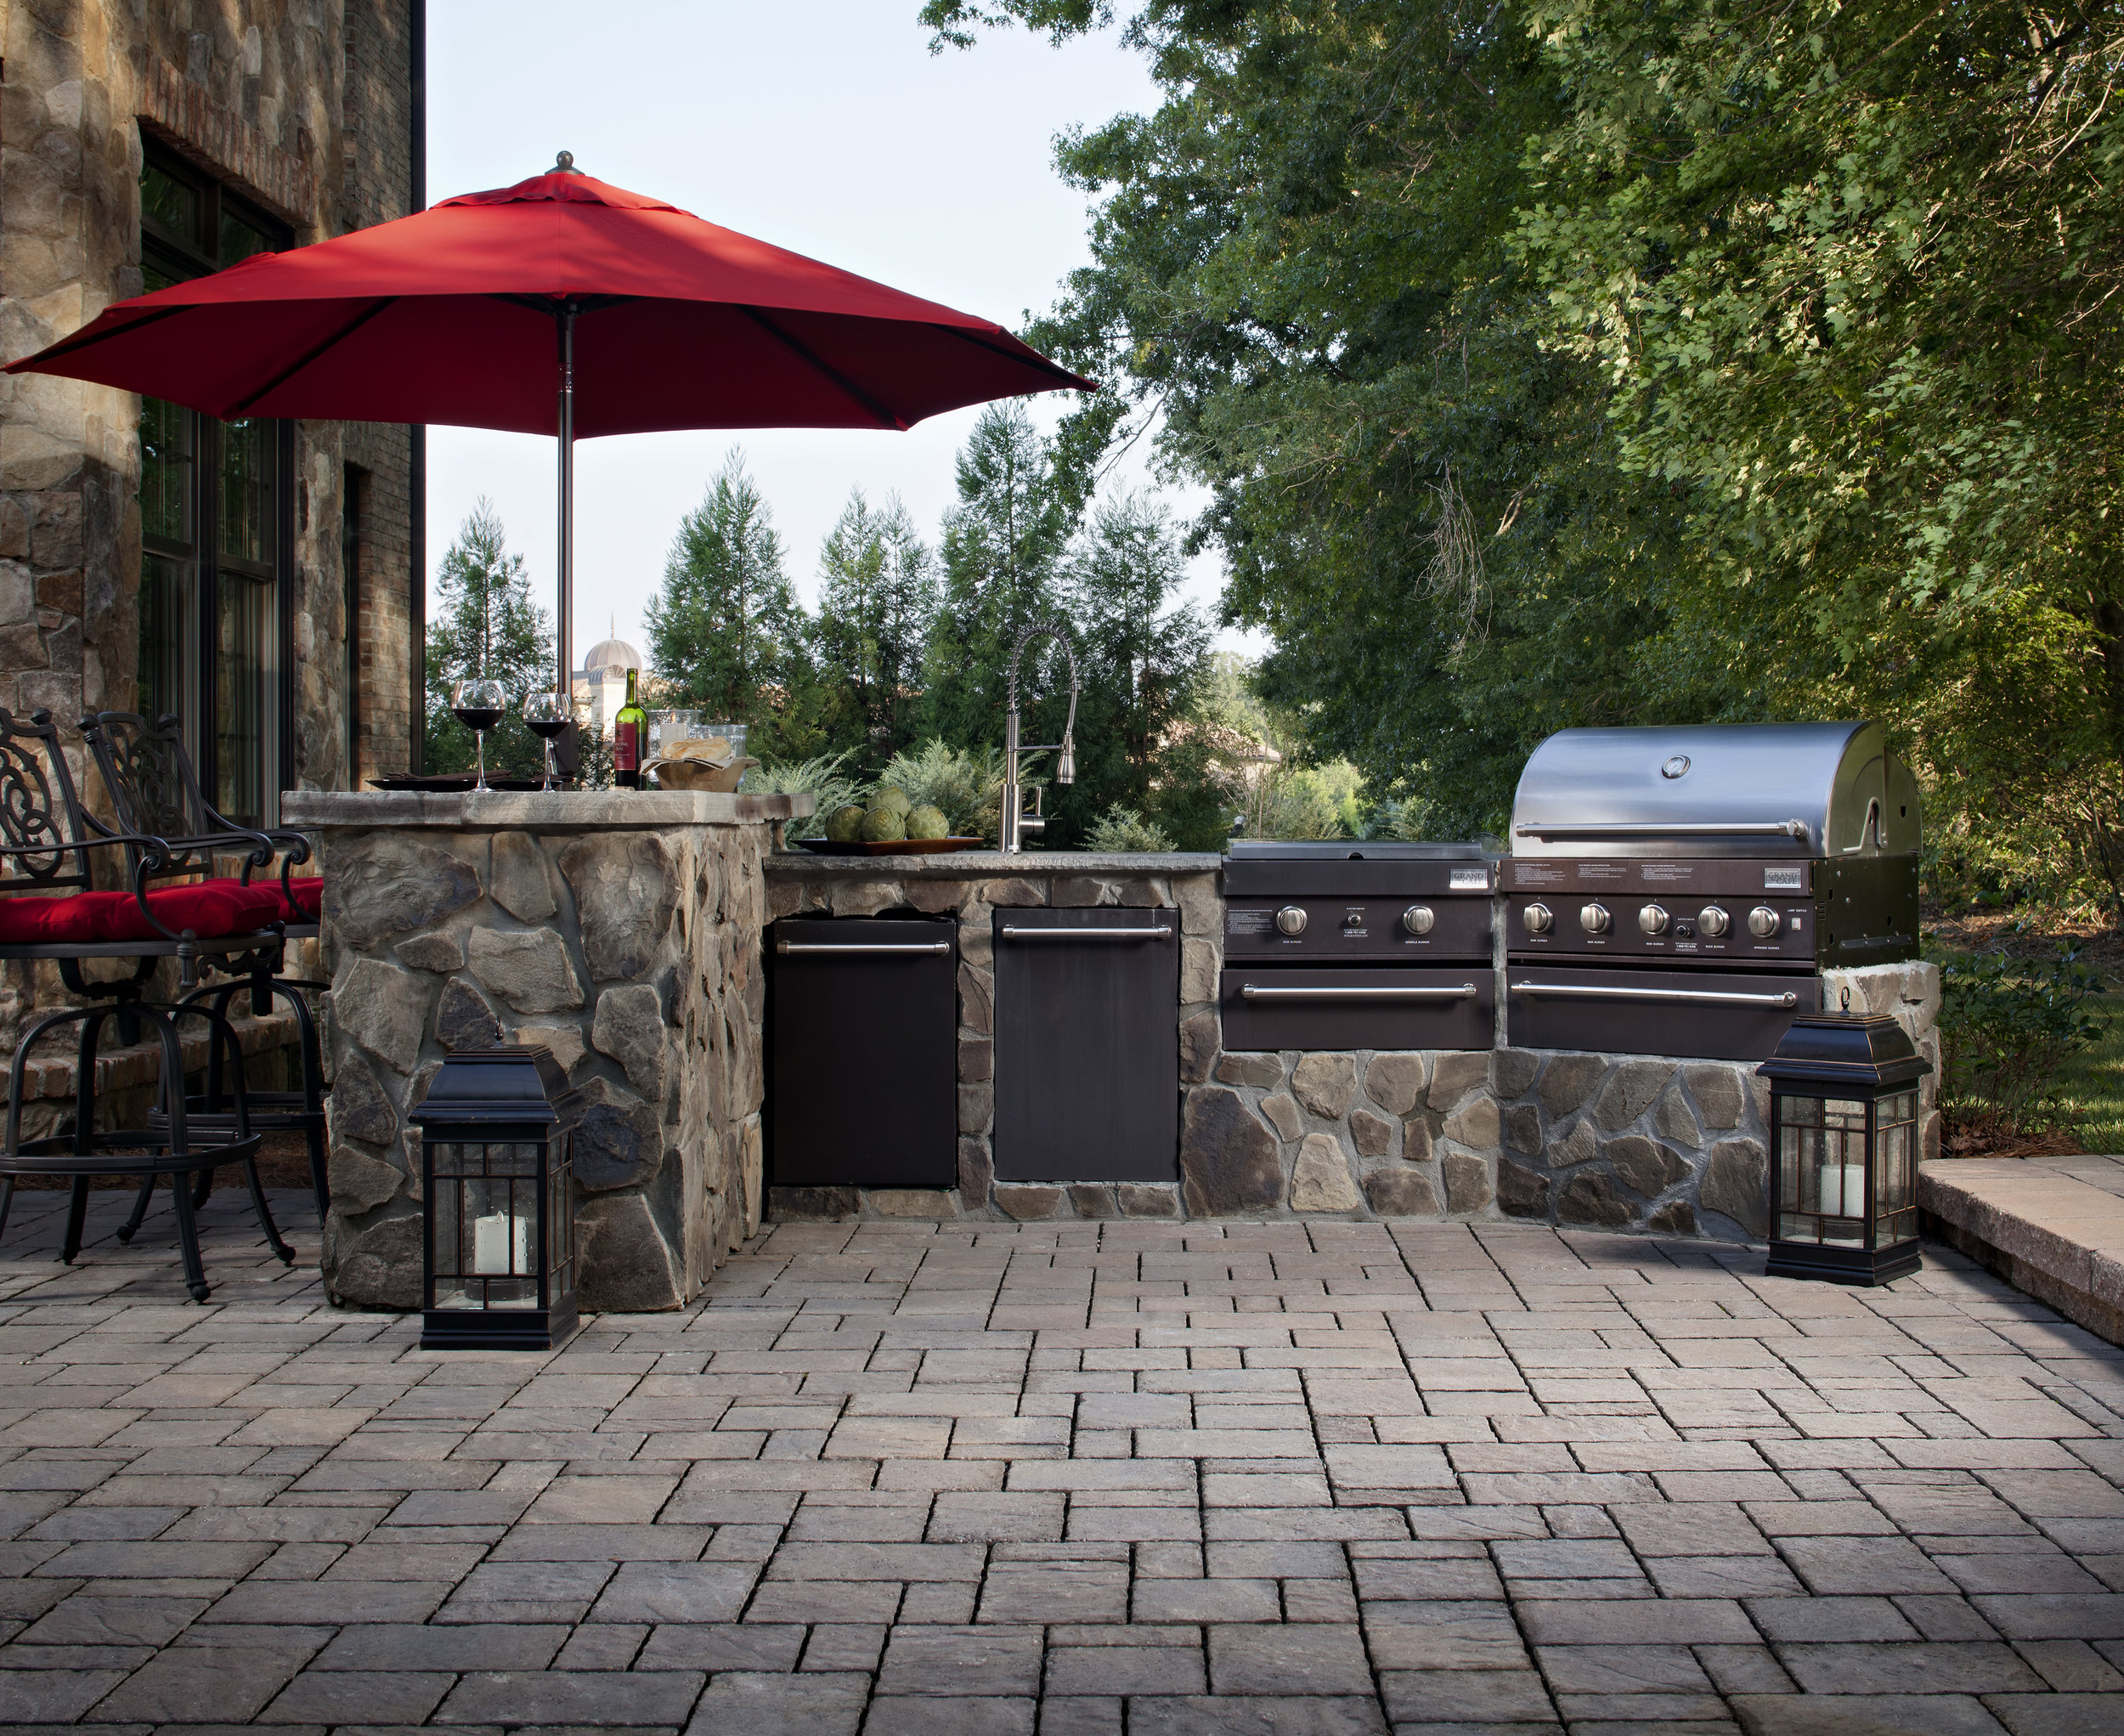 outdoor kitchen bbq dining patio landscape design backyard